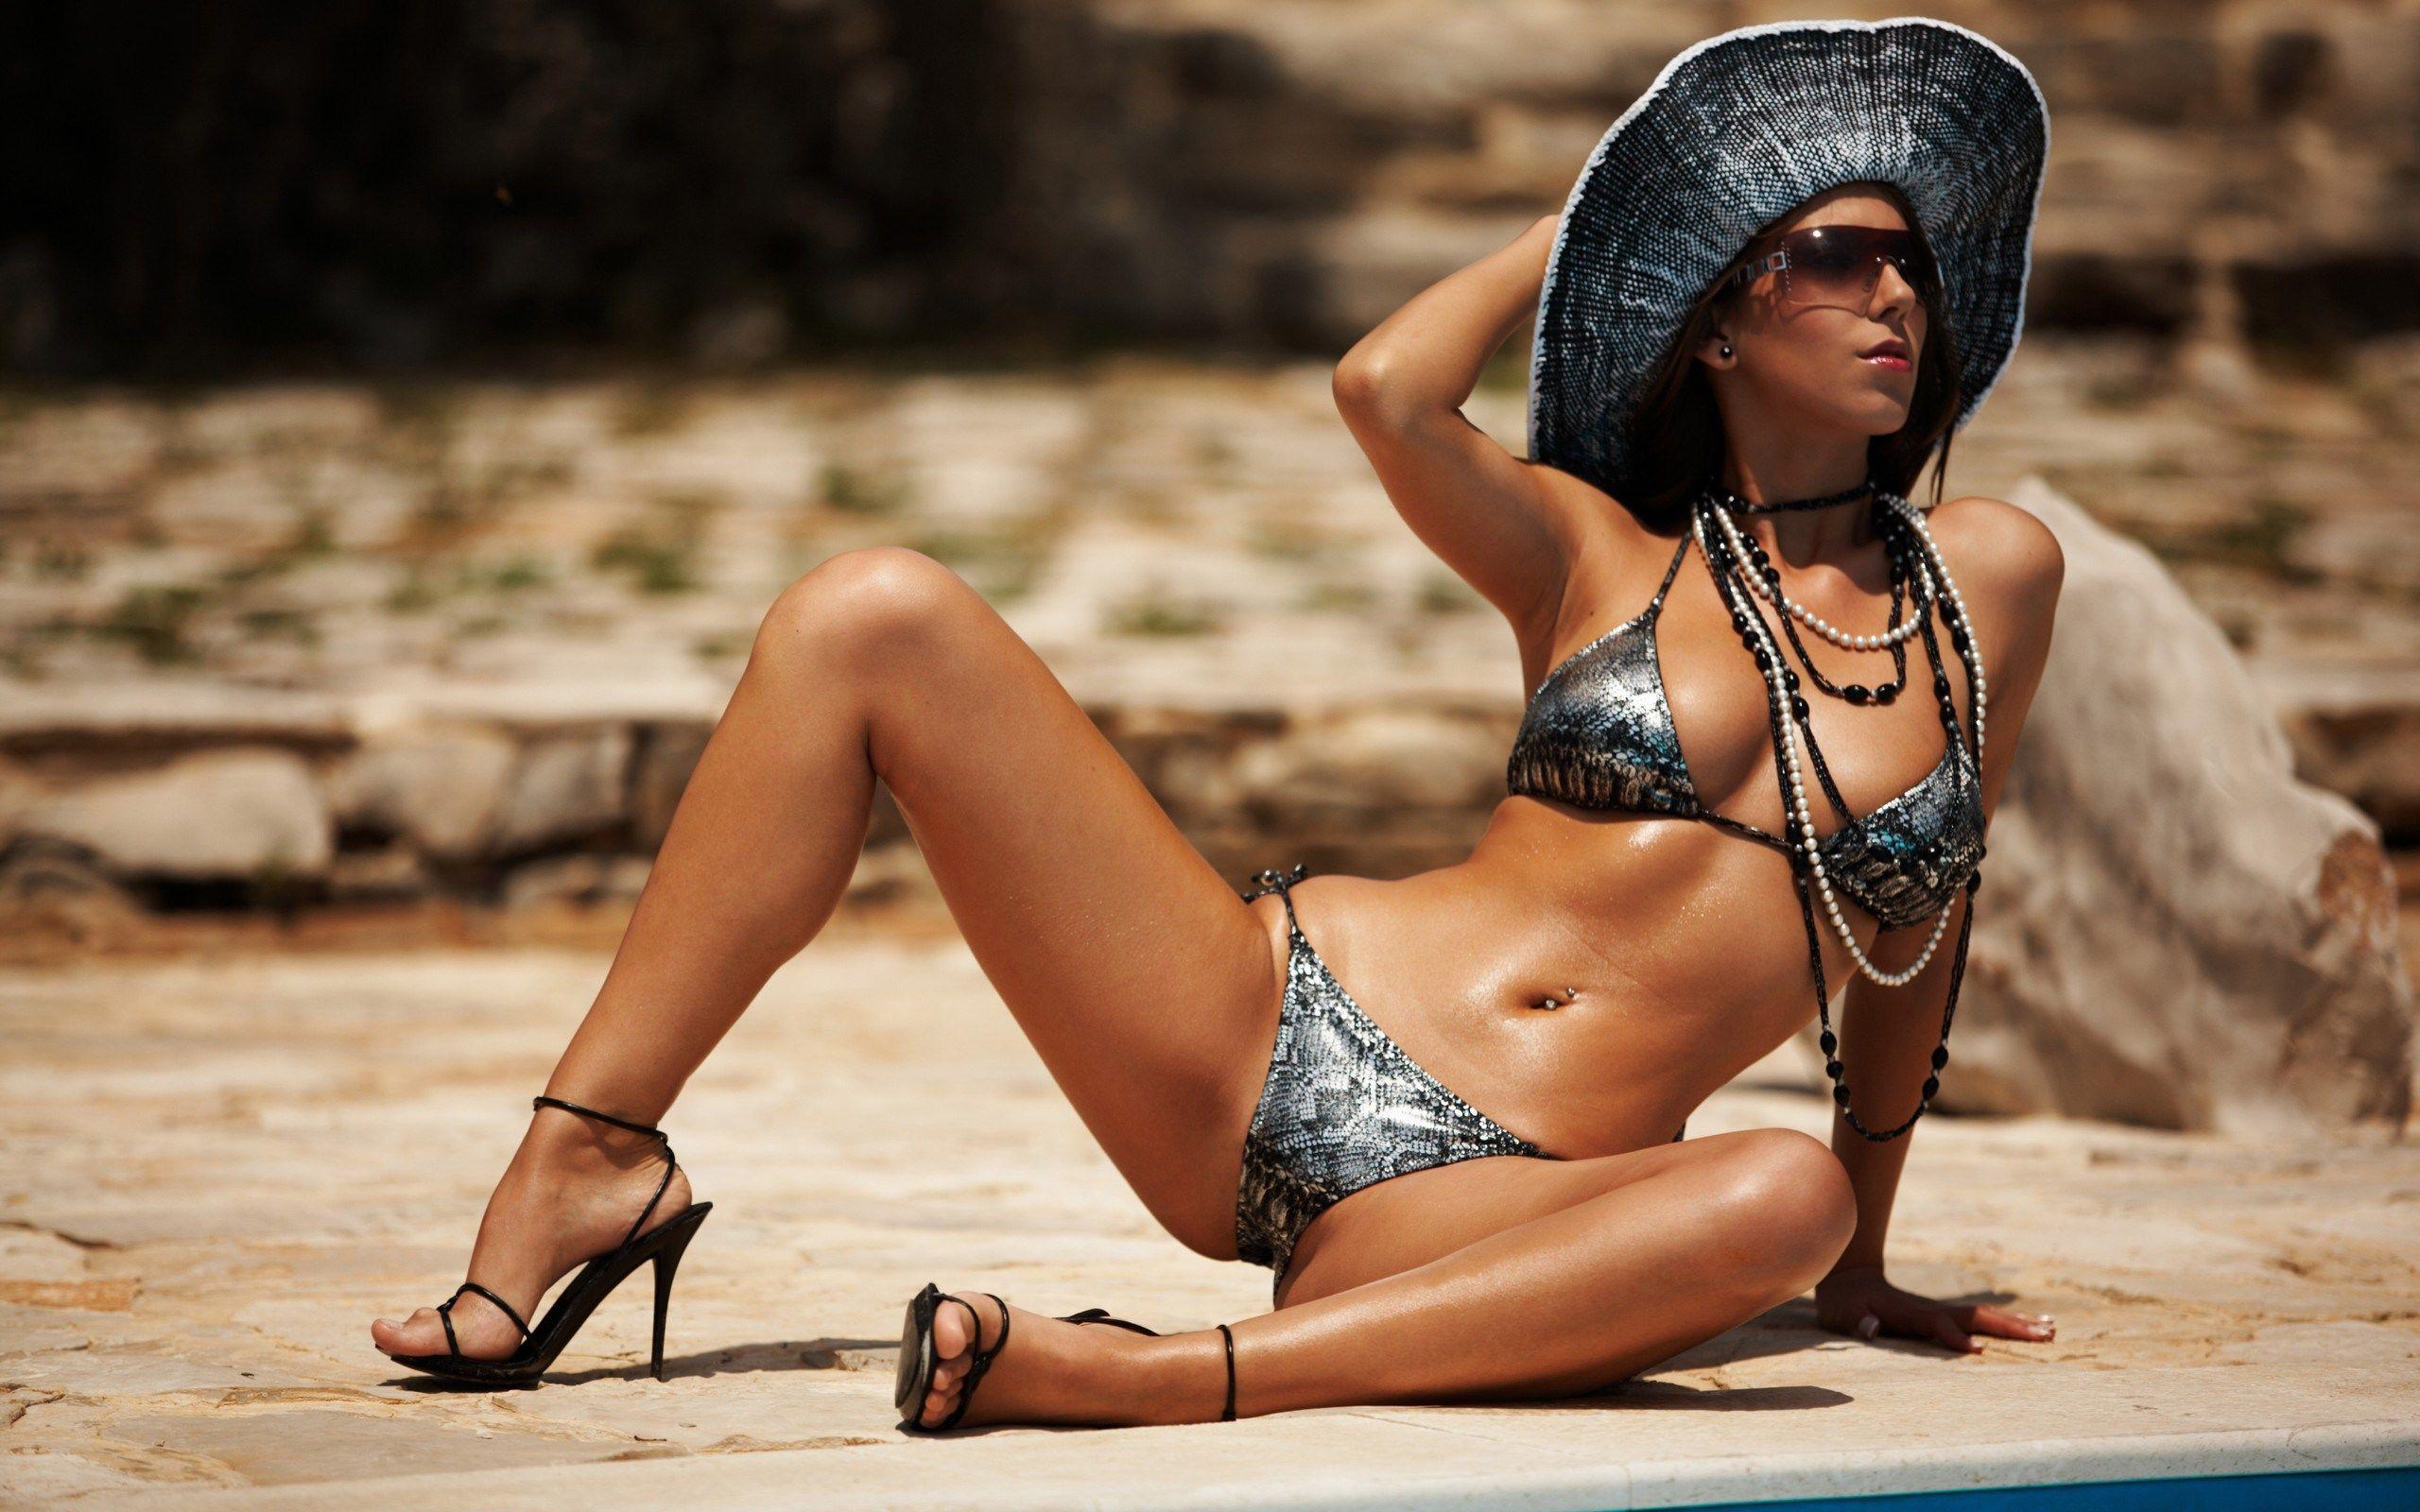 Adp model kimberly loses virginity-5645